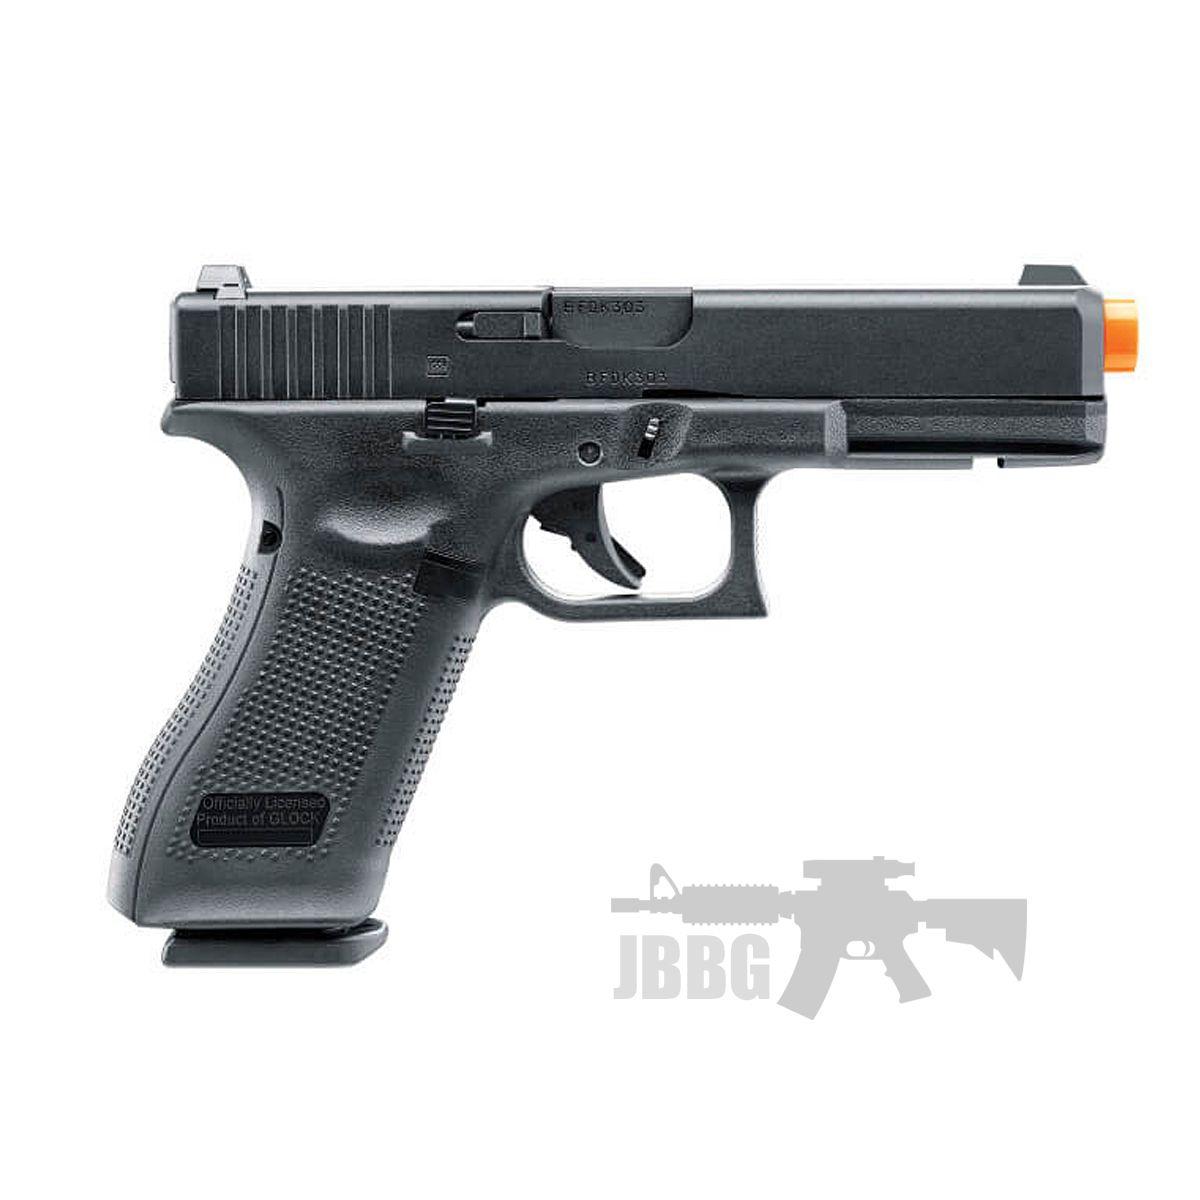 Glock G17 Gen5 Airsoft Gas Pistol with Blowback